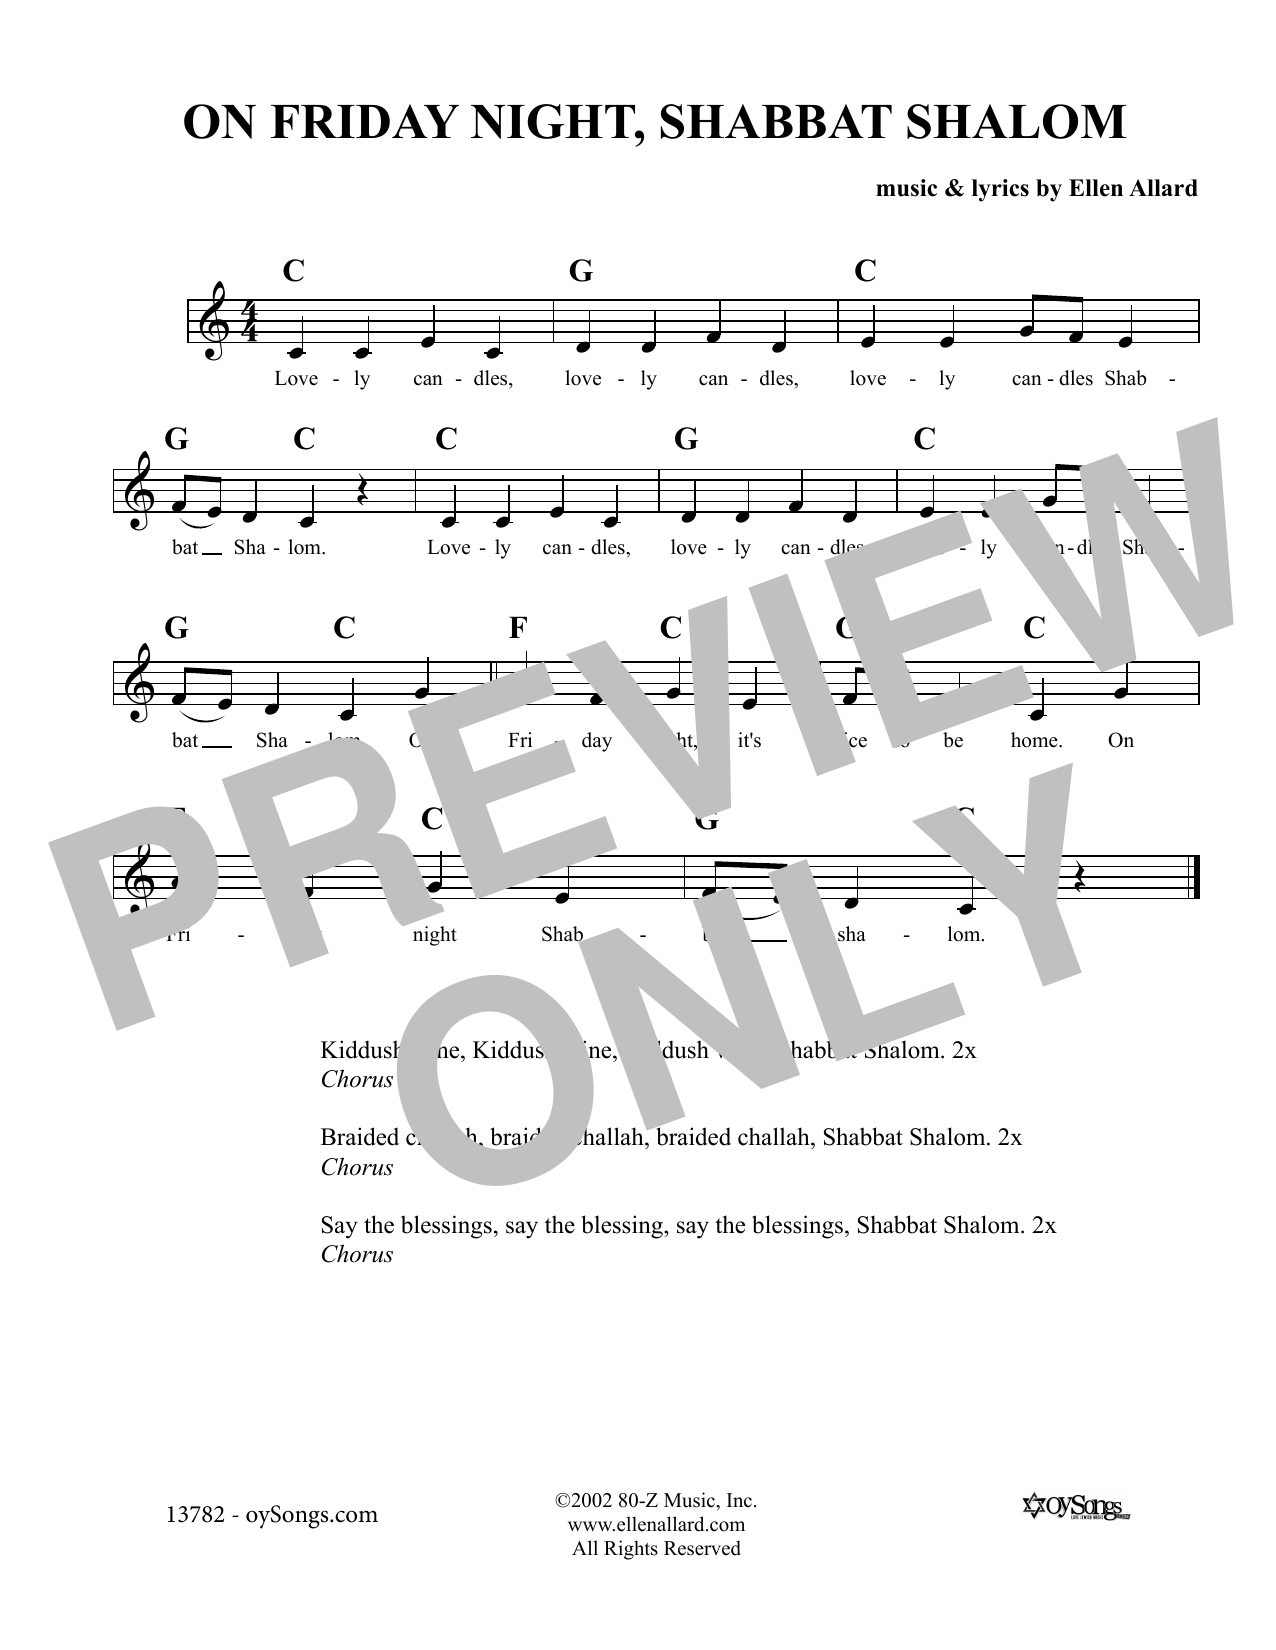 Ellen Allard On Friday Night Shabbat Shalom sheet music notes and chords. Download Printable PDF.